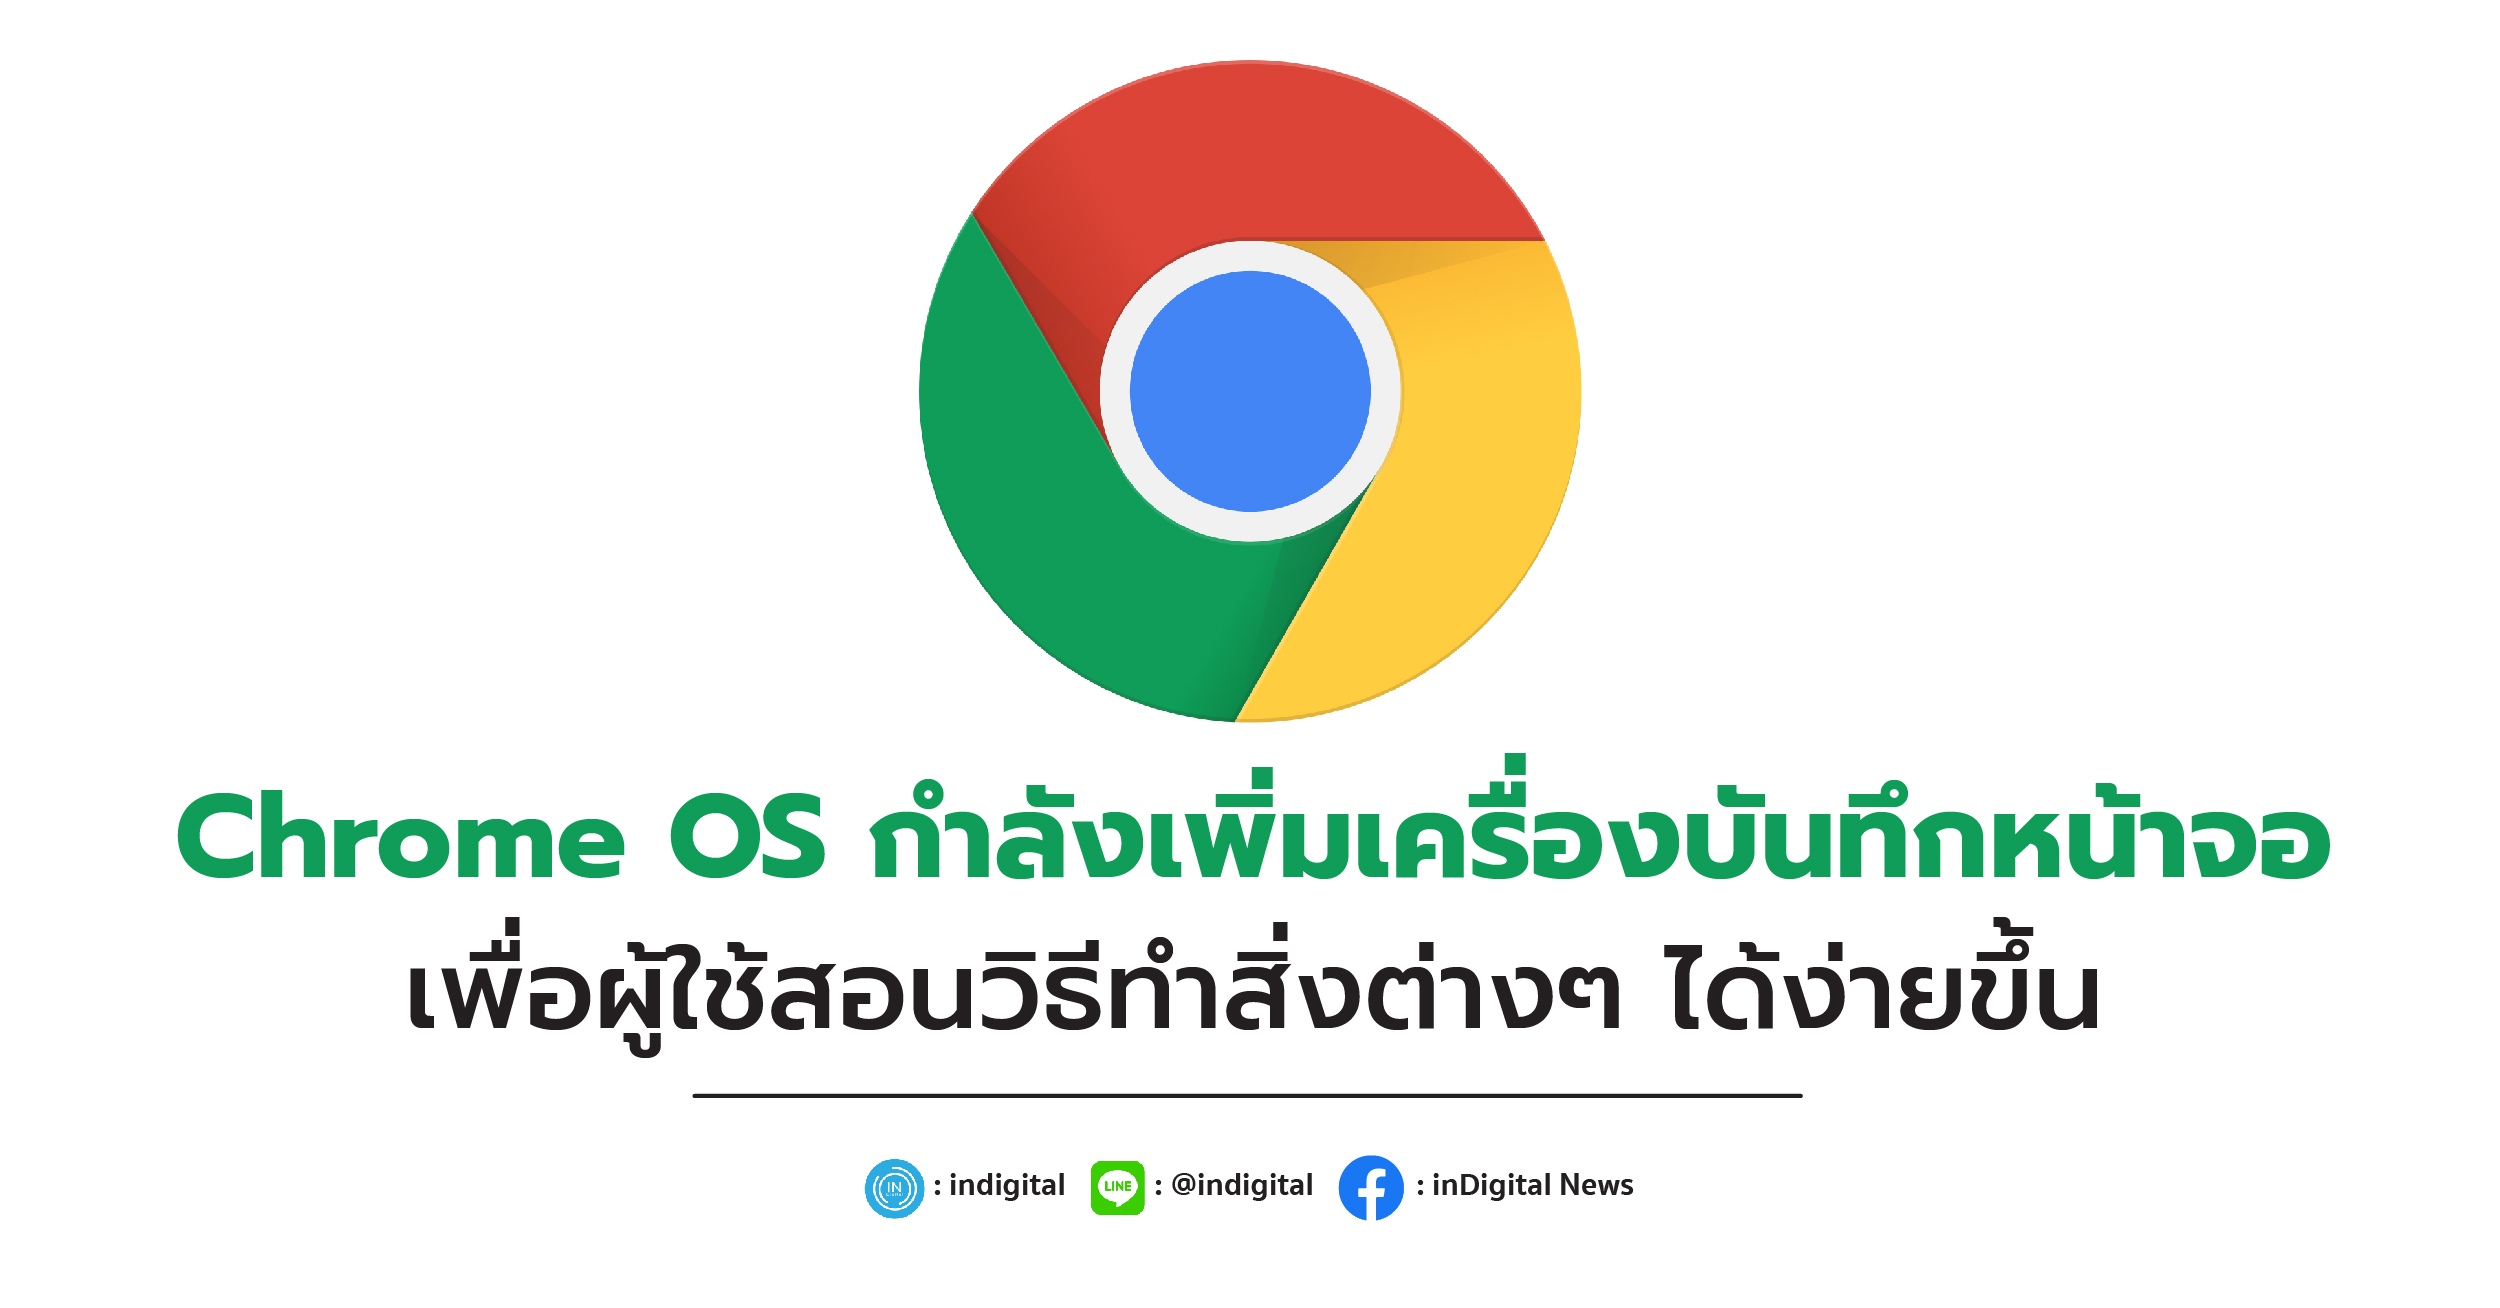 Chrome OS กำลังเพิ่มเครื่องบันทึกหน้าจอเพื่อผู้ใช้สอนวิธีทำสิ่งต่างๆ ได้ง่ายขึ้น